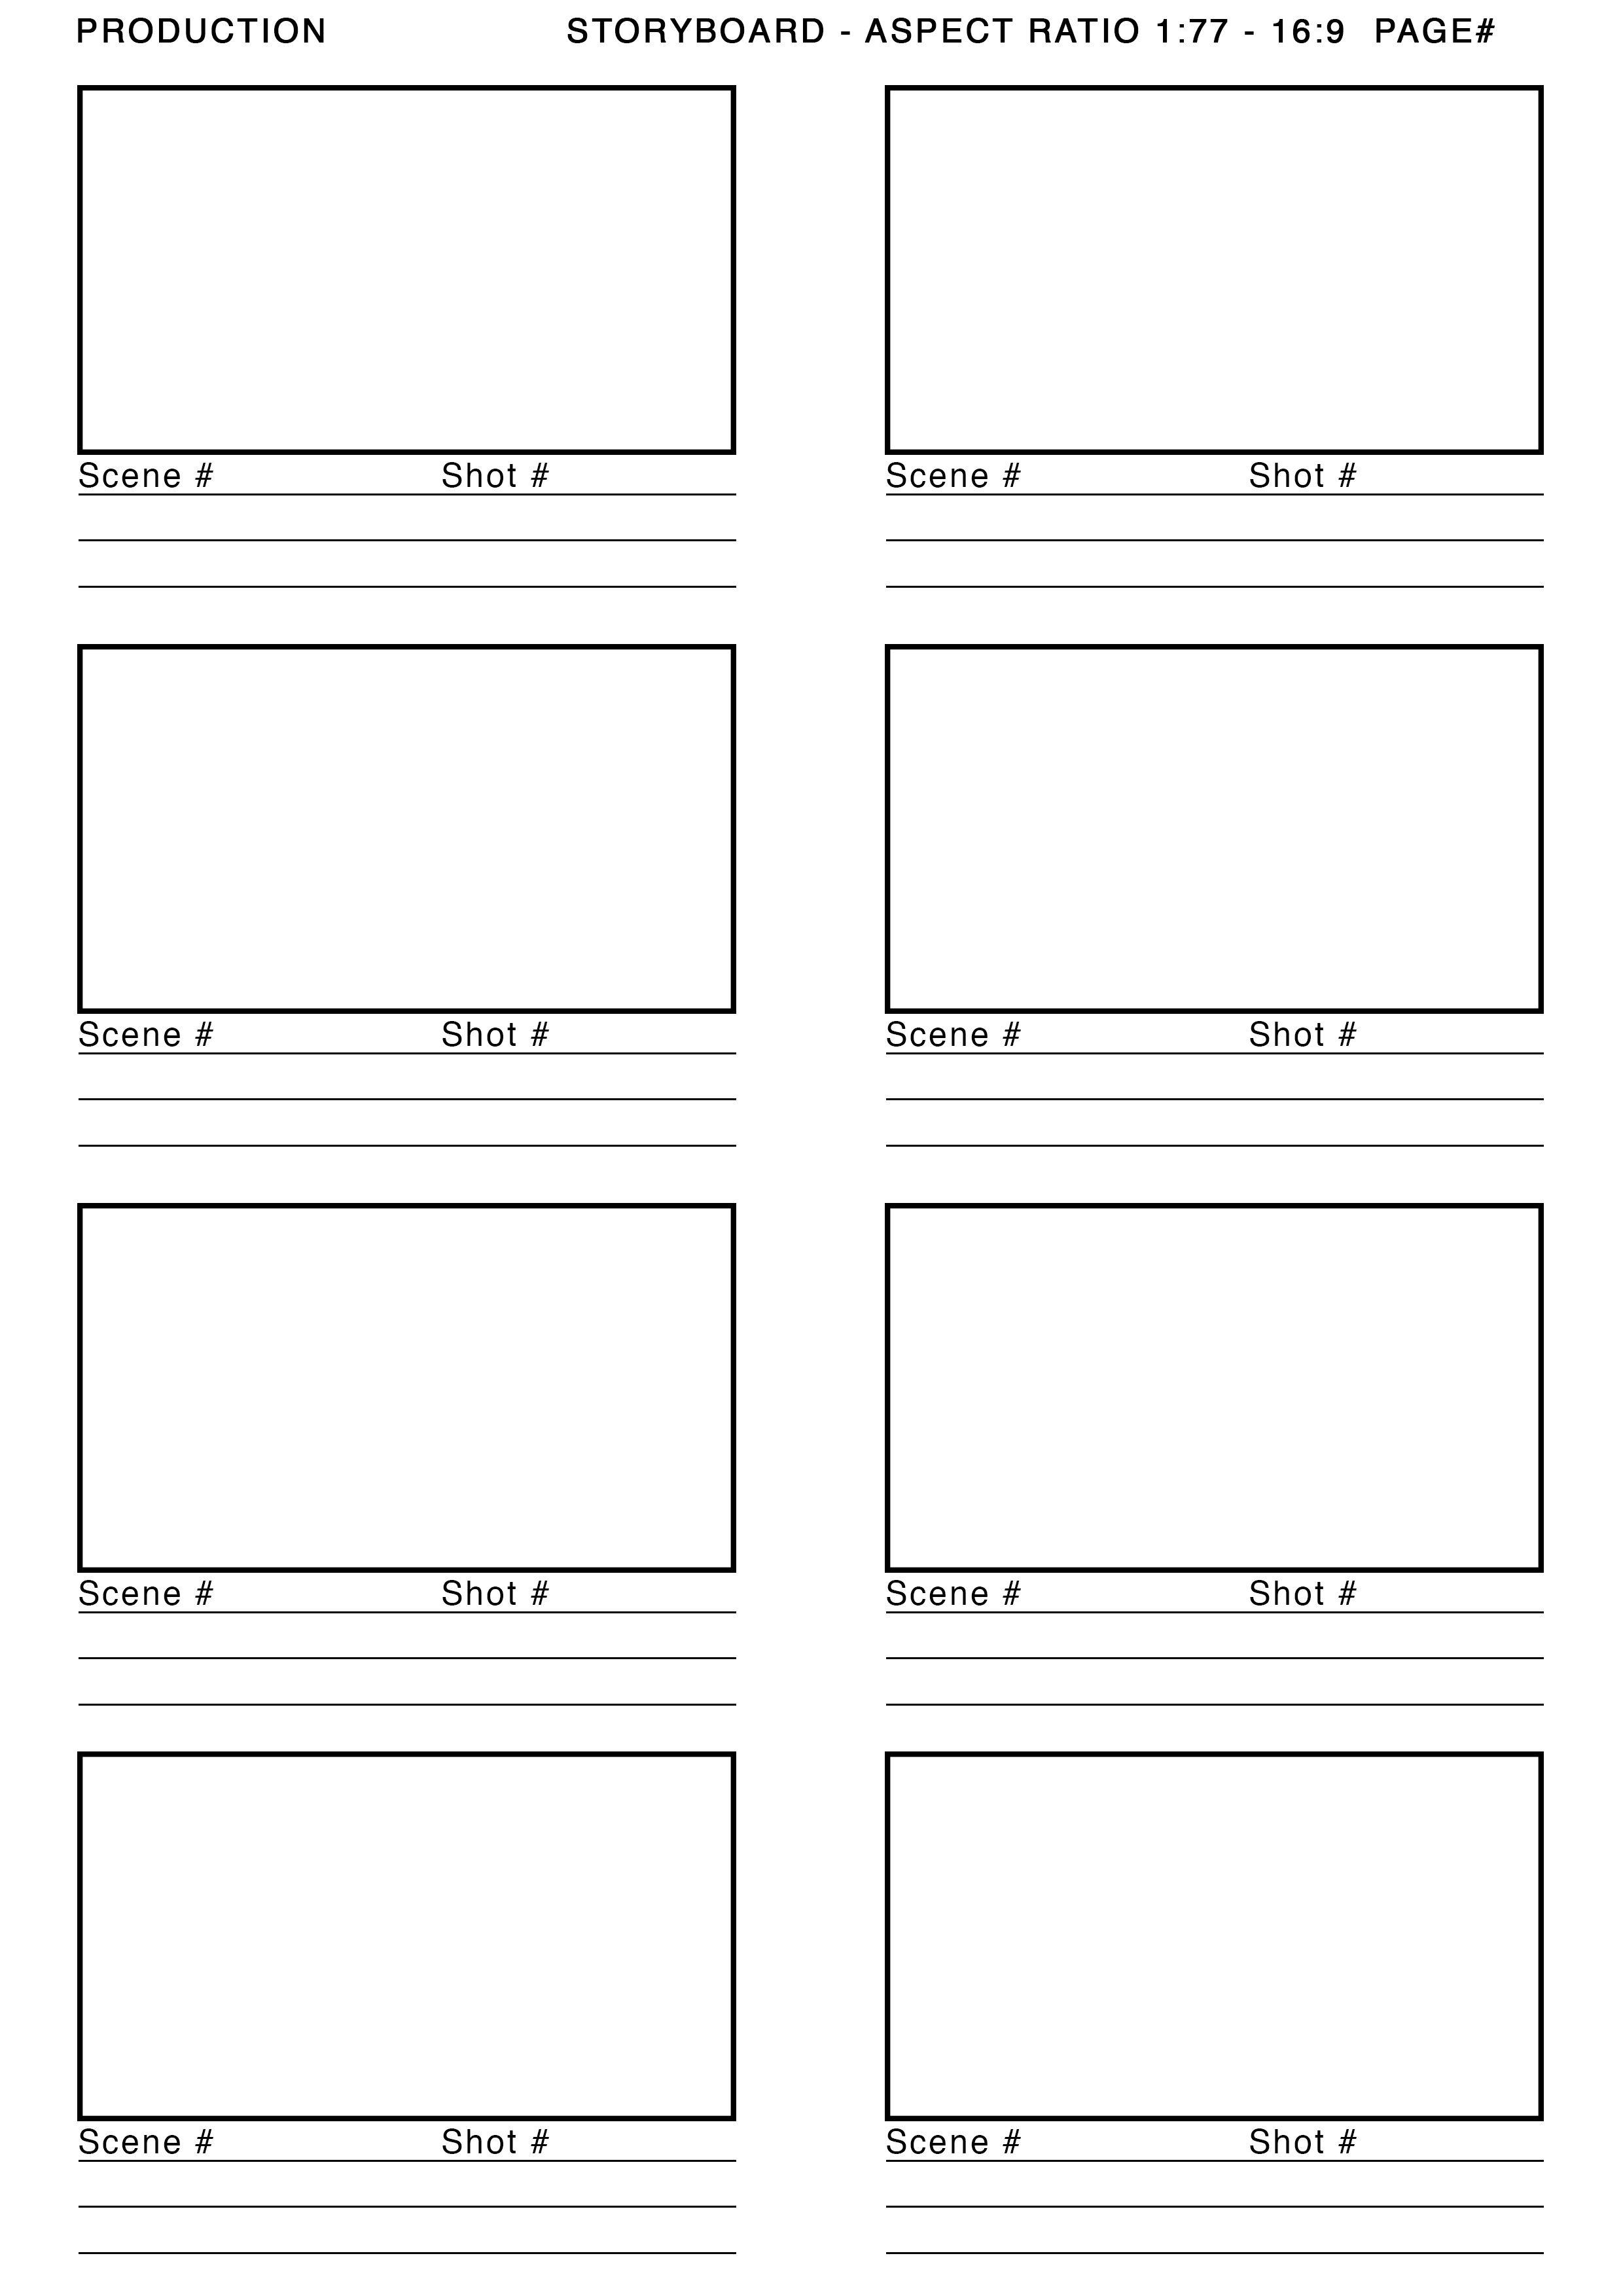 Storyboard Frame Dimensions Viewframes